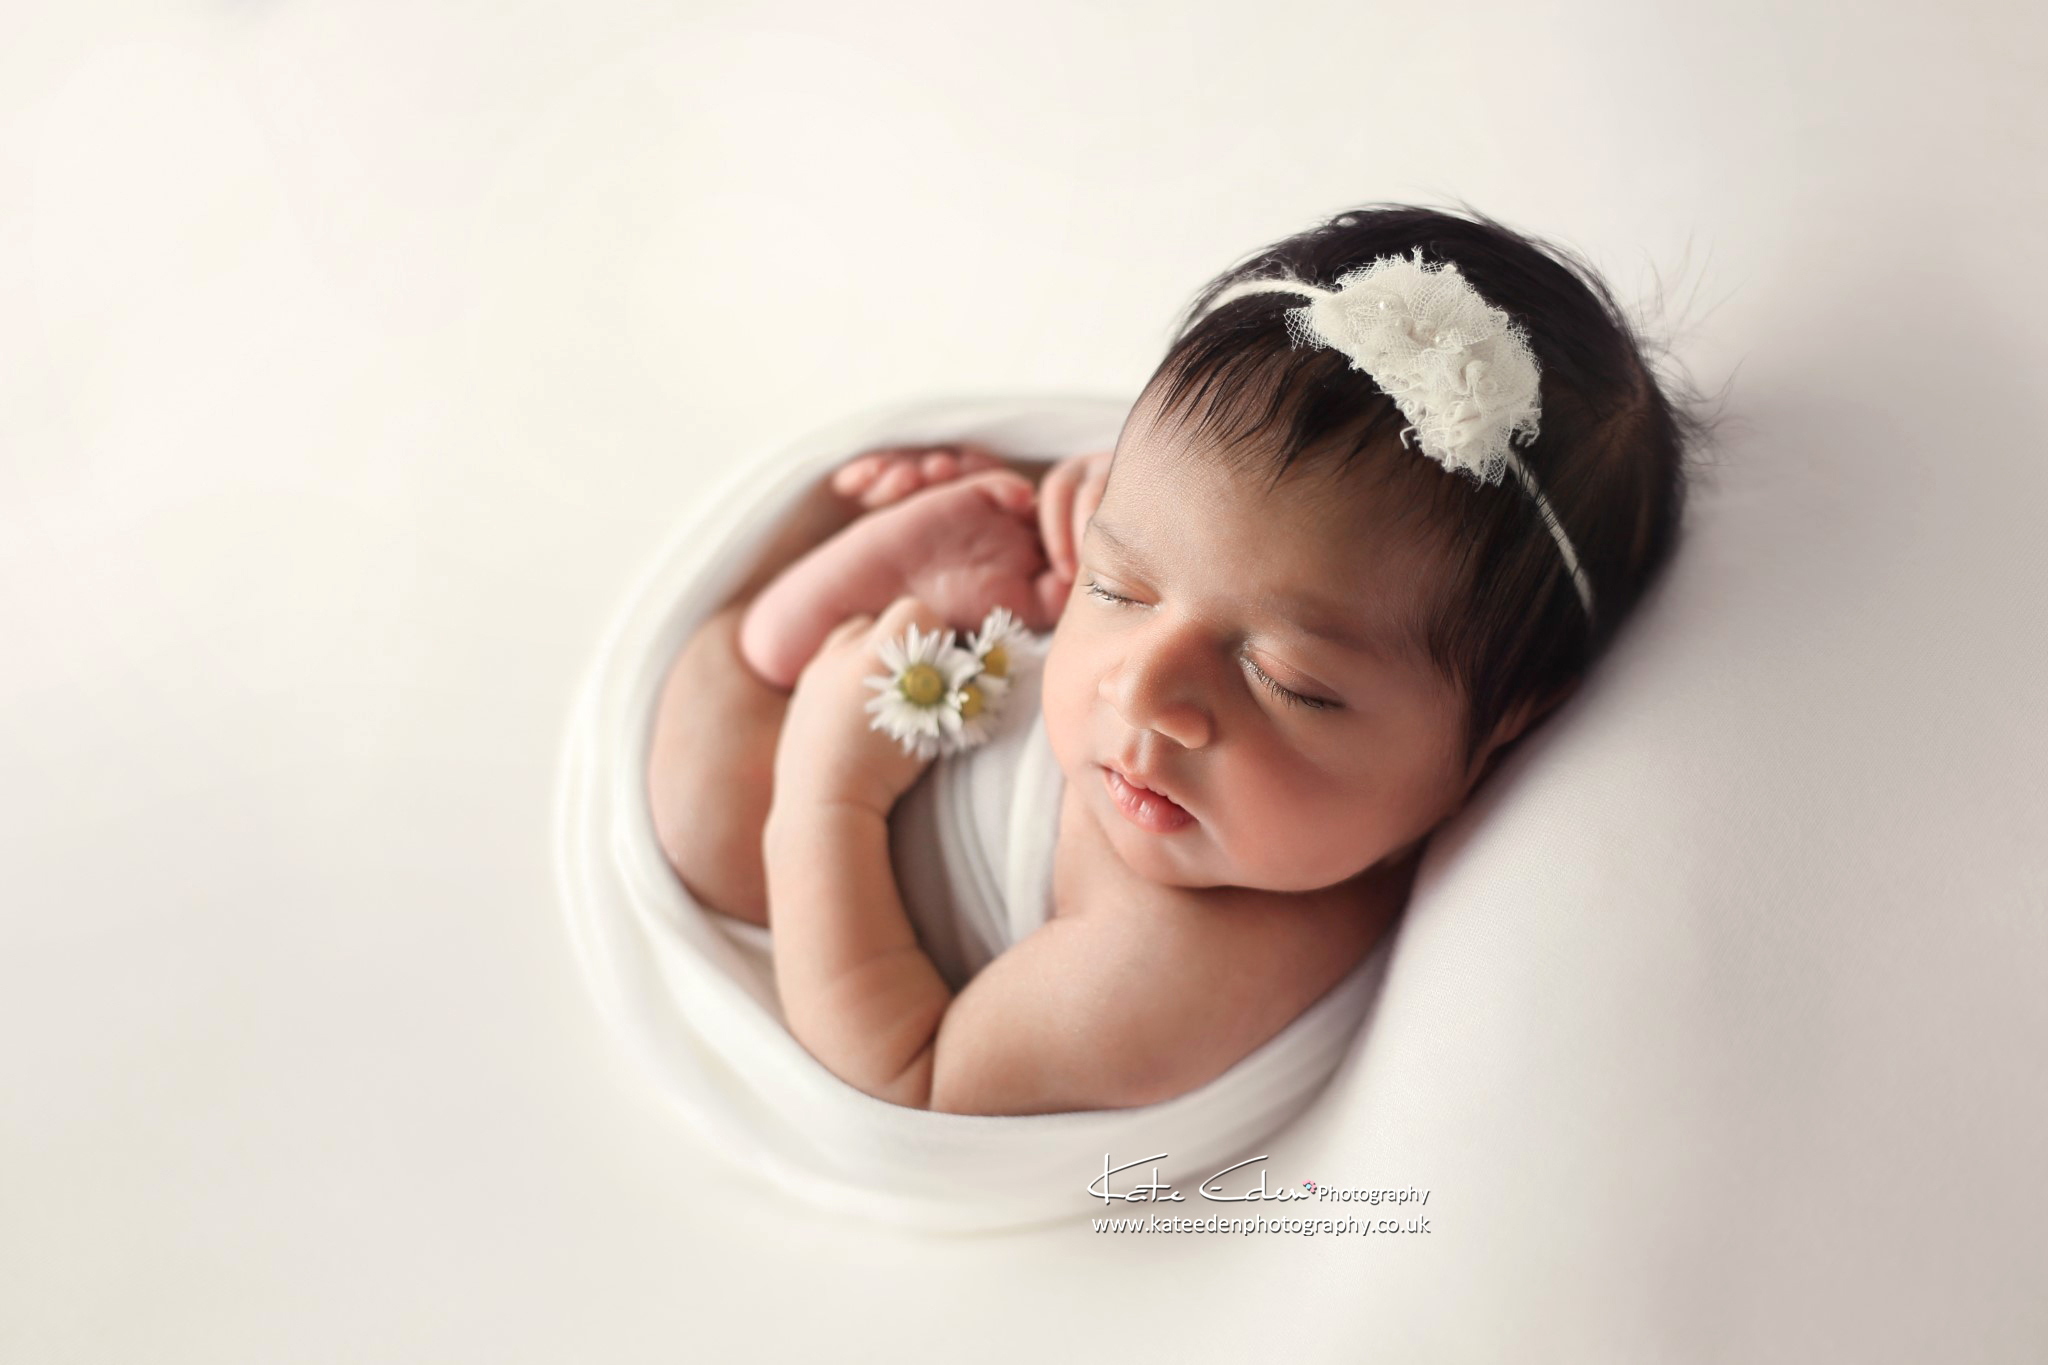 Newborn baby girl in white - London newborn photographer - Kate Eden Photography